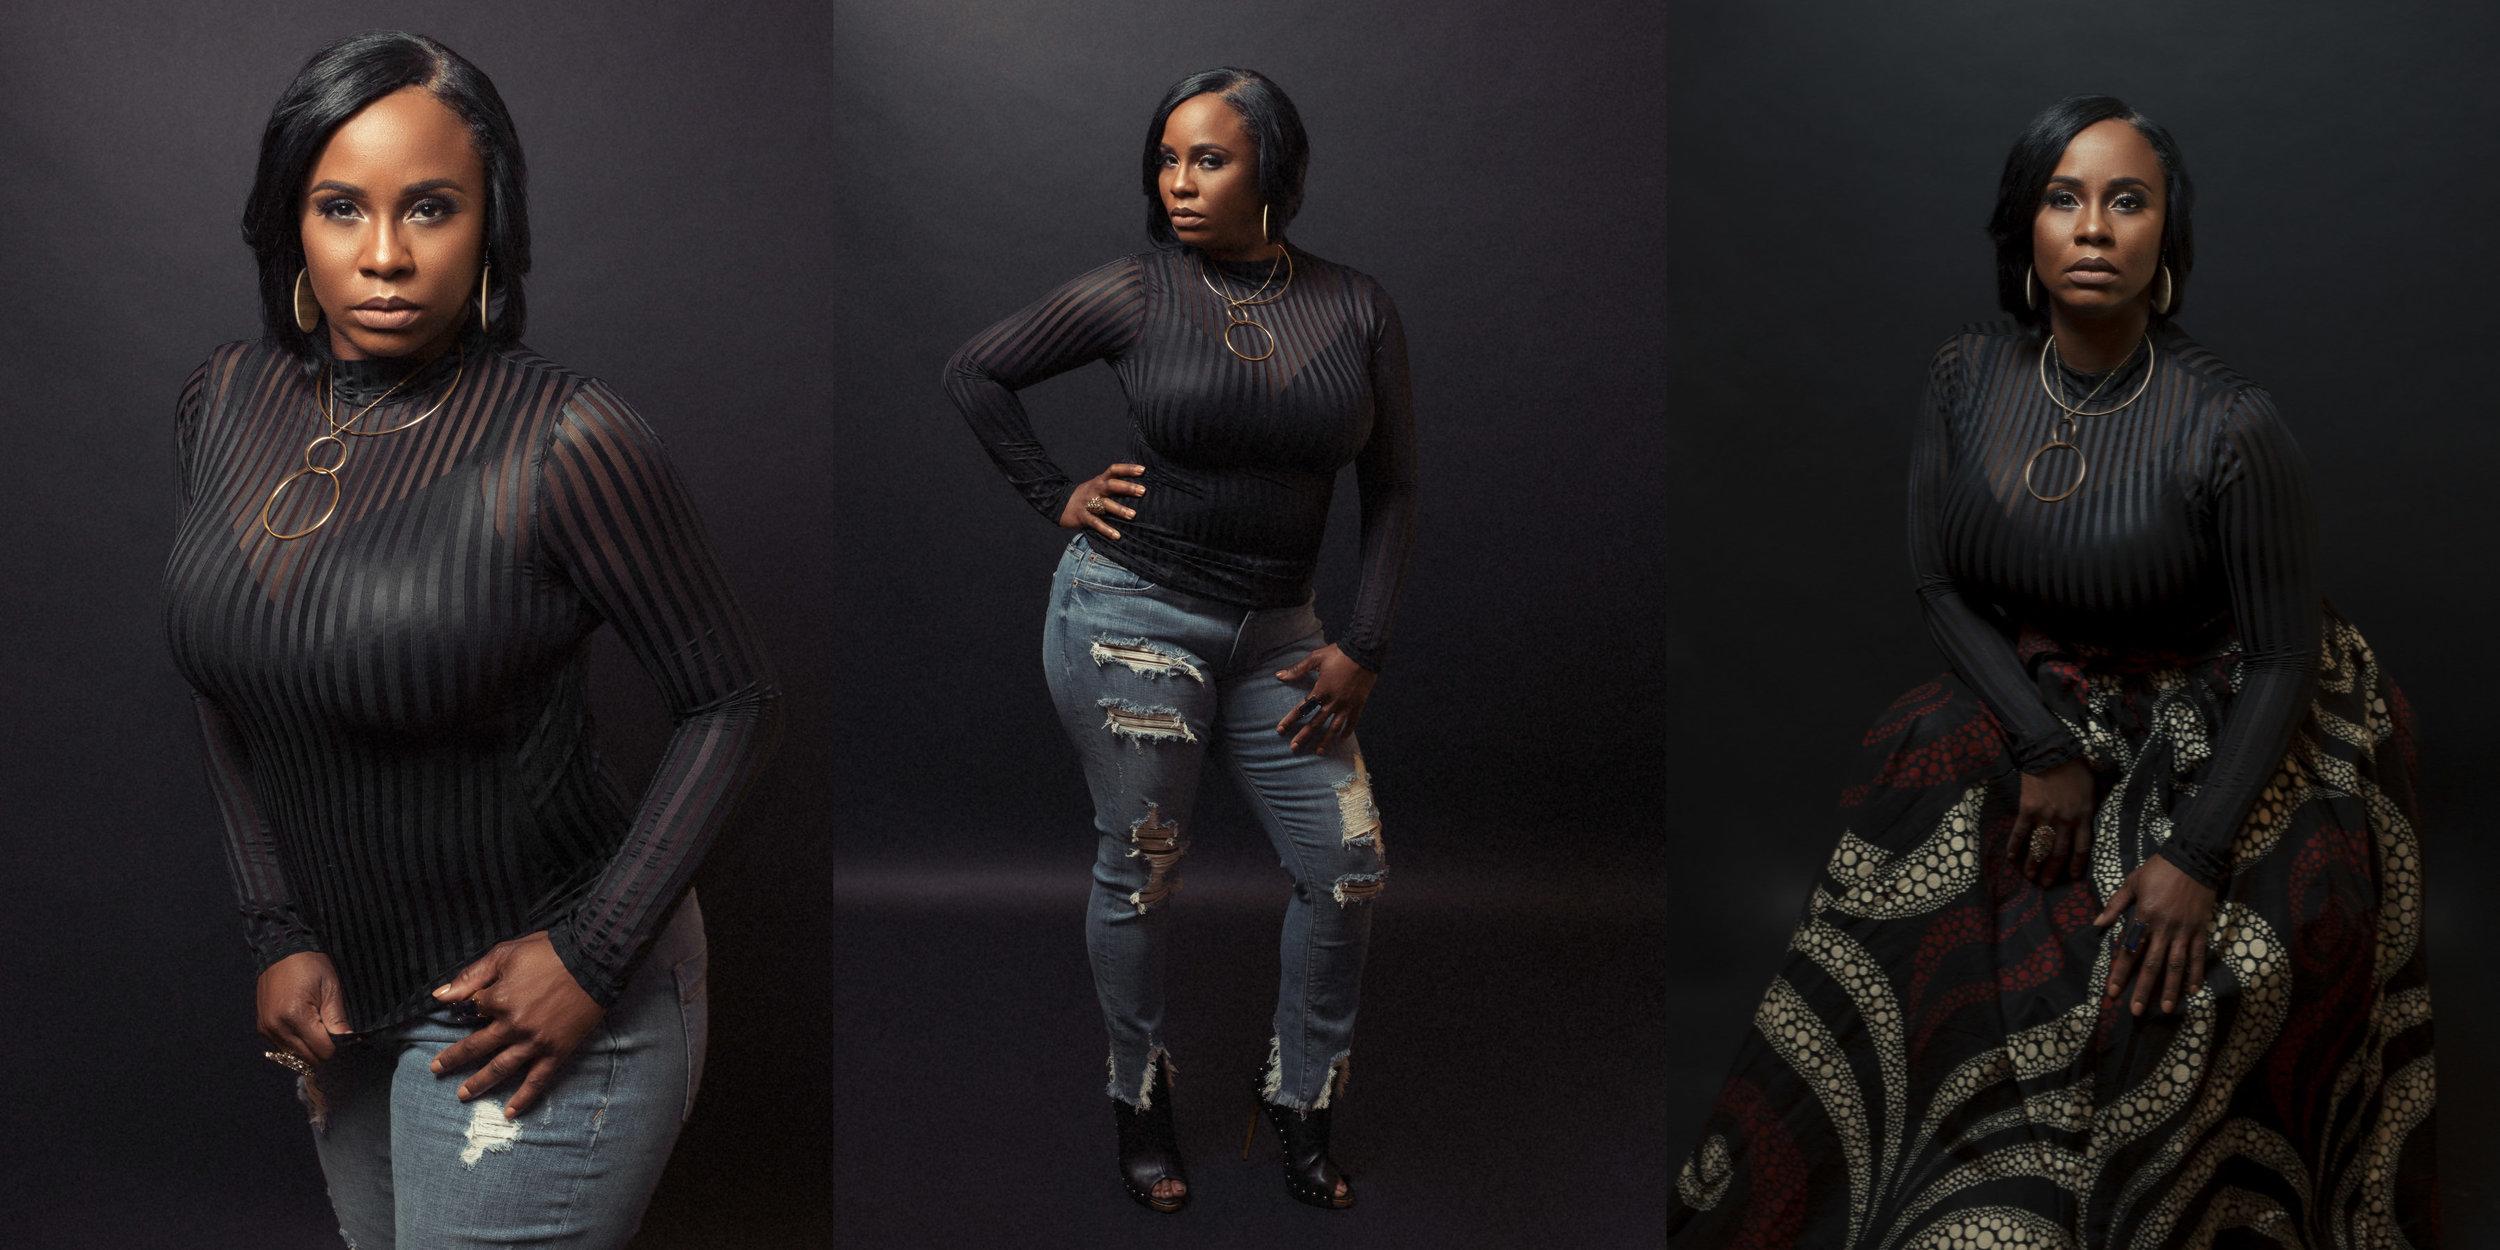 Dallas Portrait Beauty Photographer -12.jpg